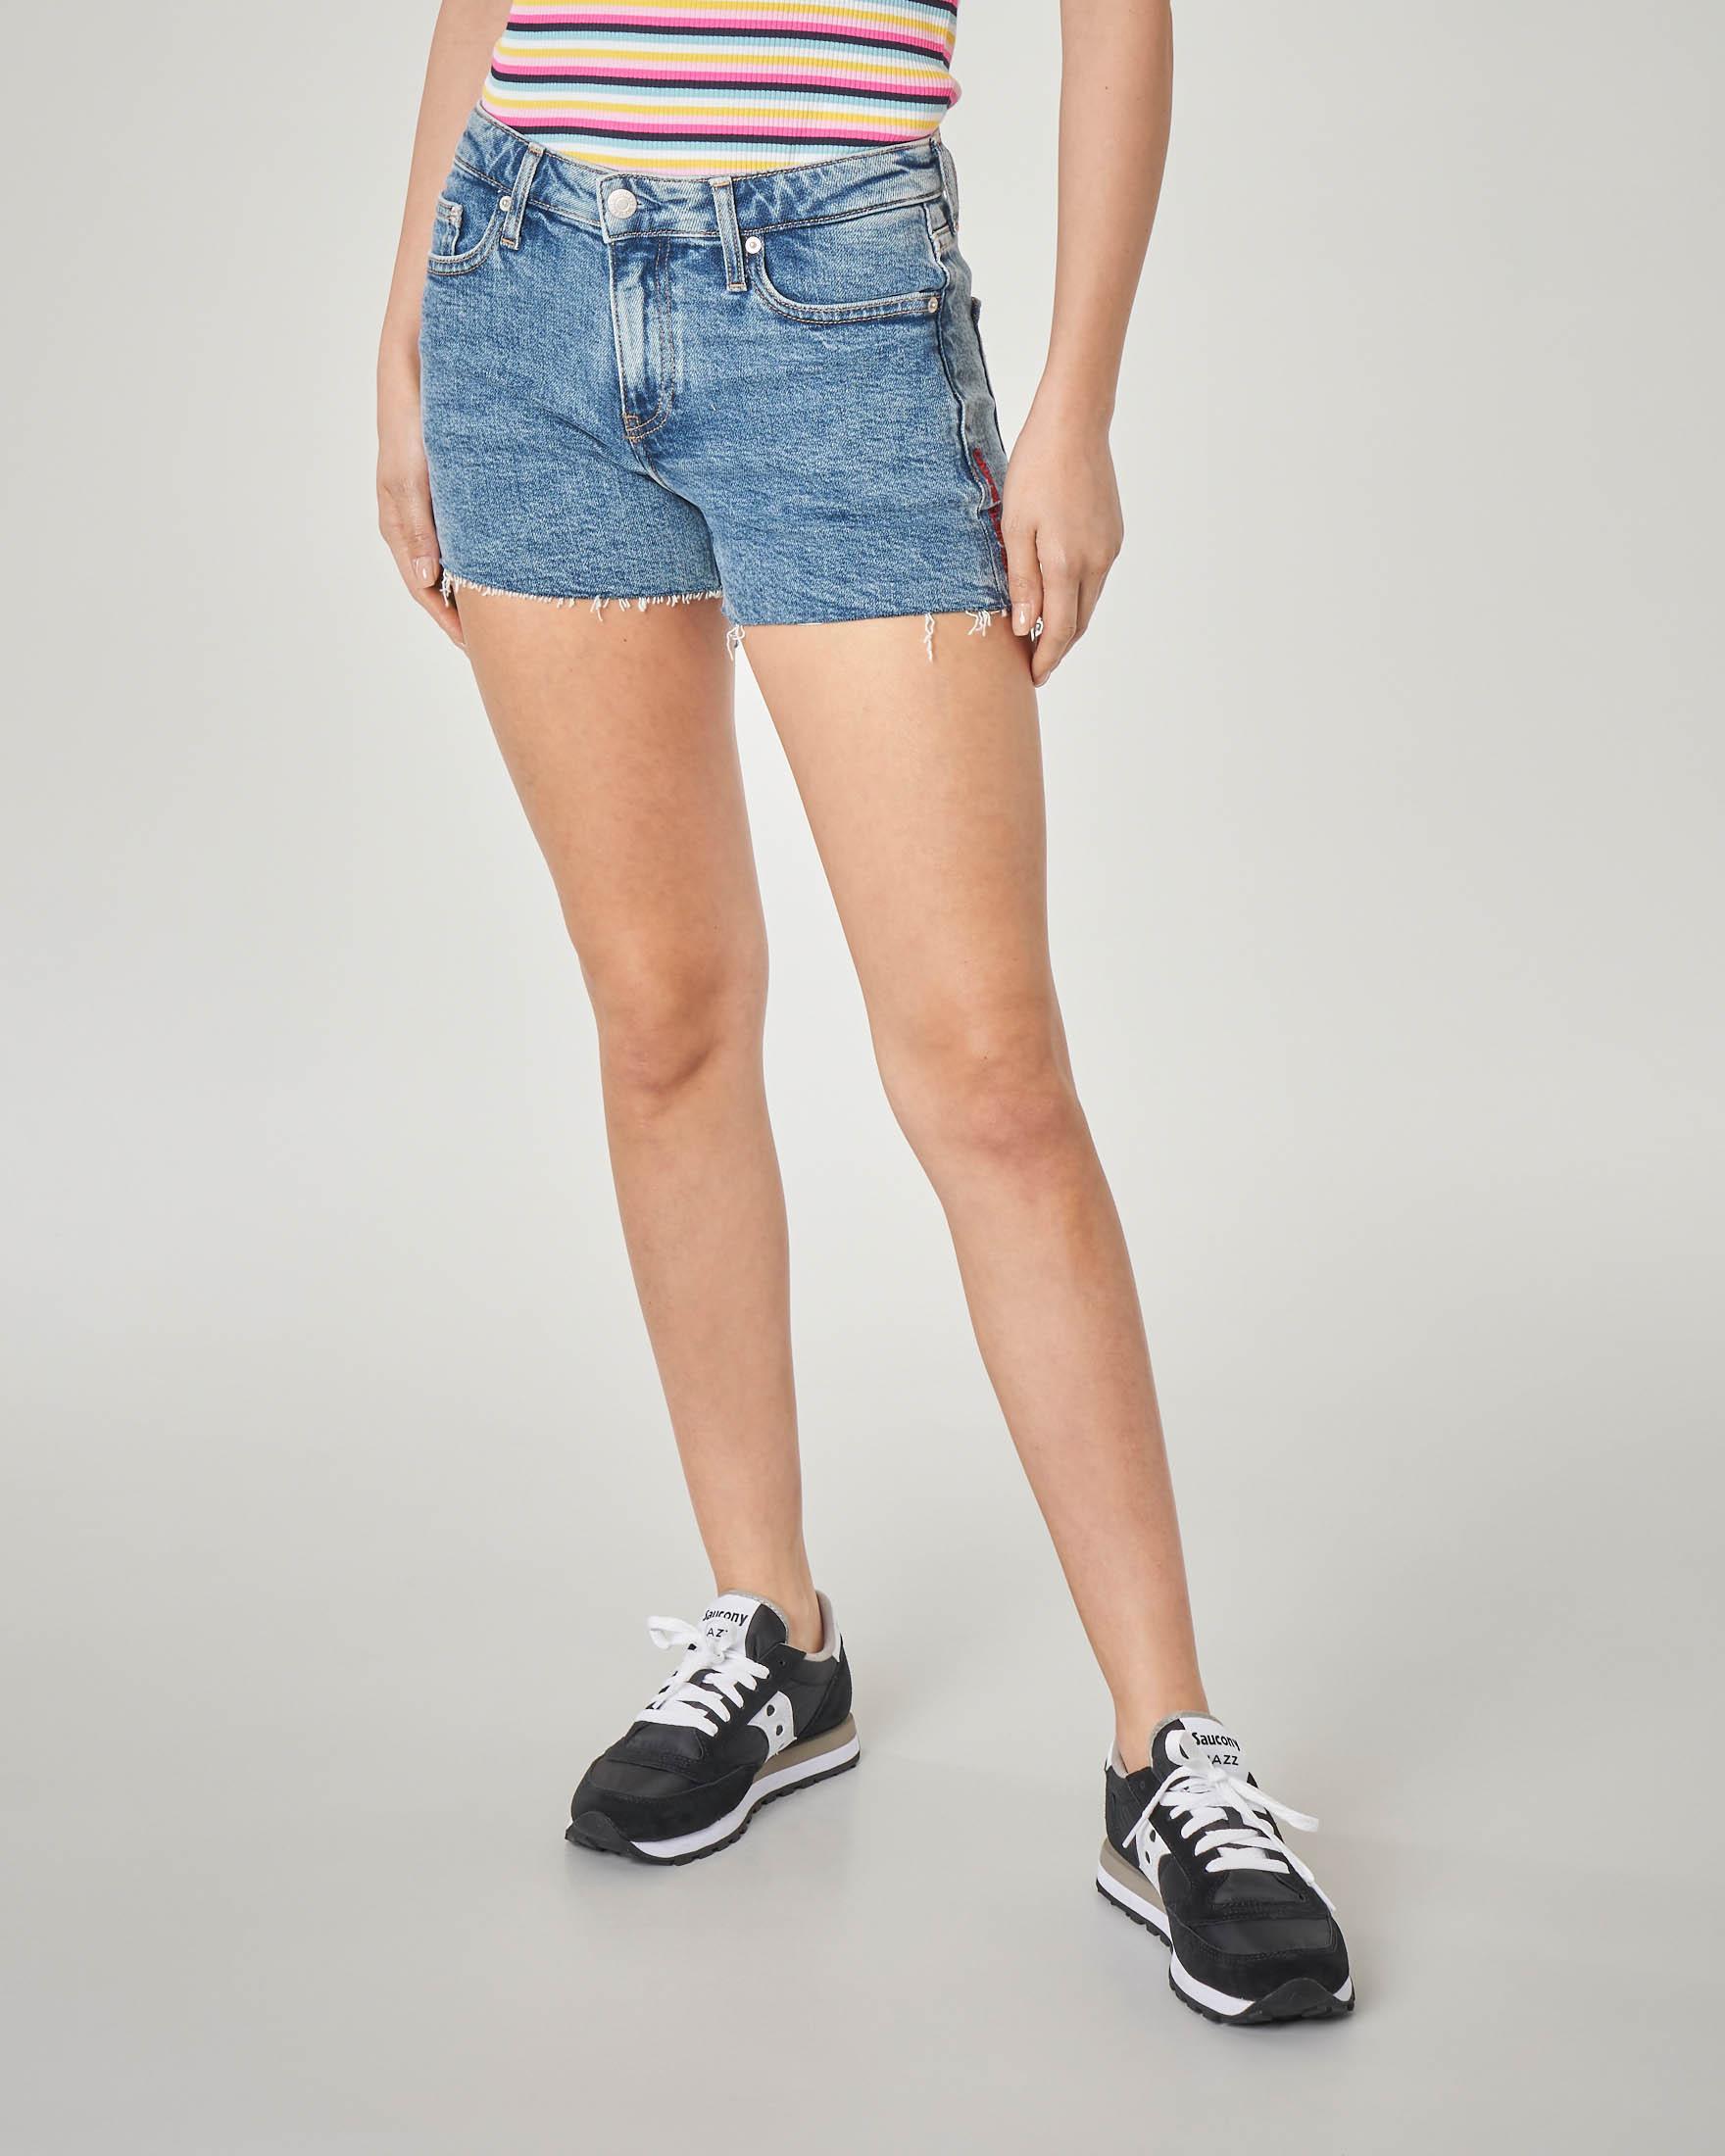 Shorts in denim blu delavè con scritta logo rossa ricamata sulla gamba